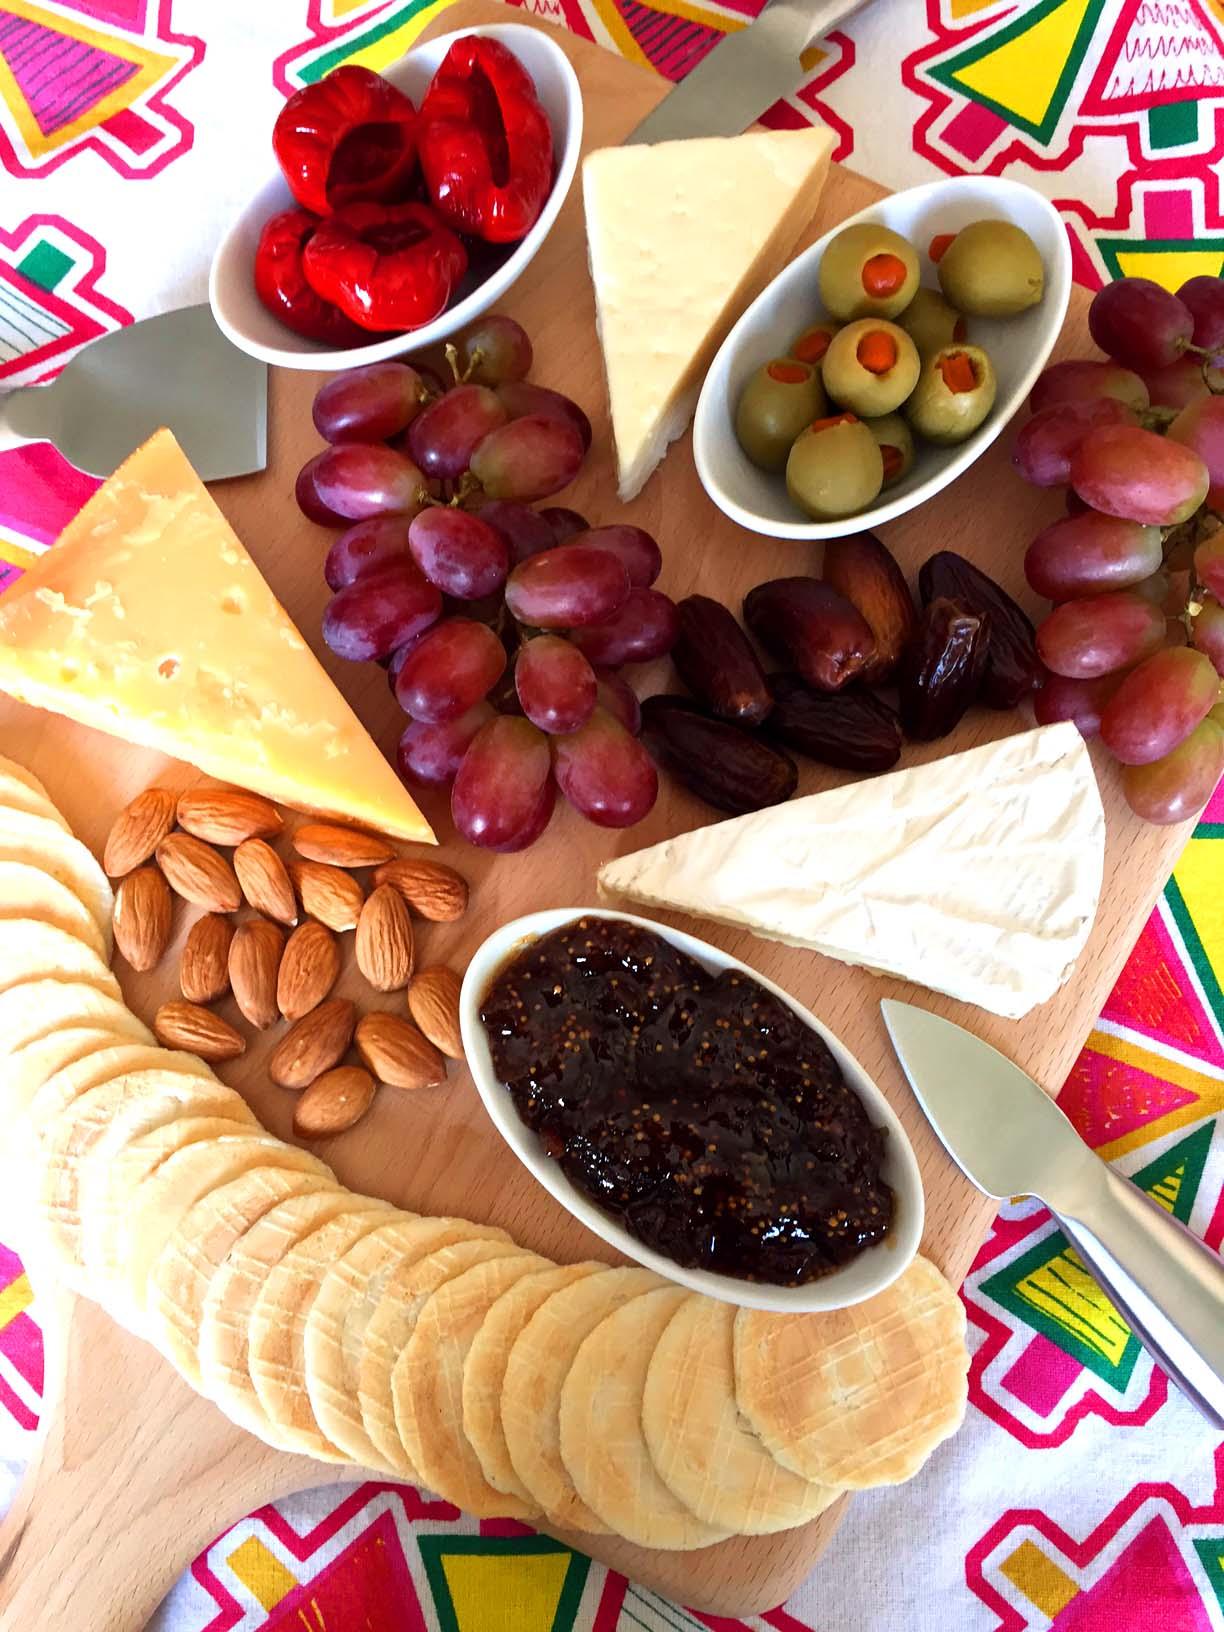 Epic Cheese Board Ideas Best Cheese Cracker Fruit Platter Ever Melanie Cooks